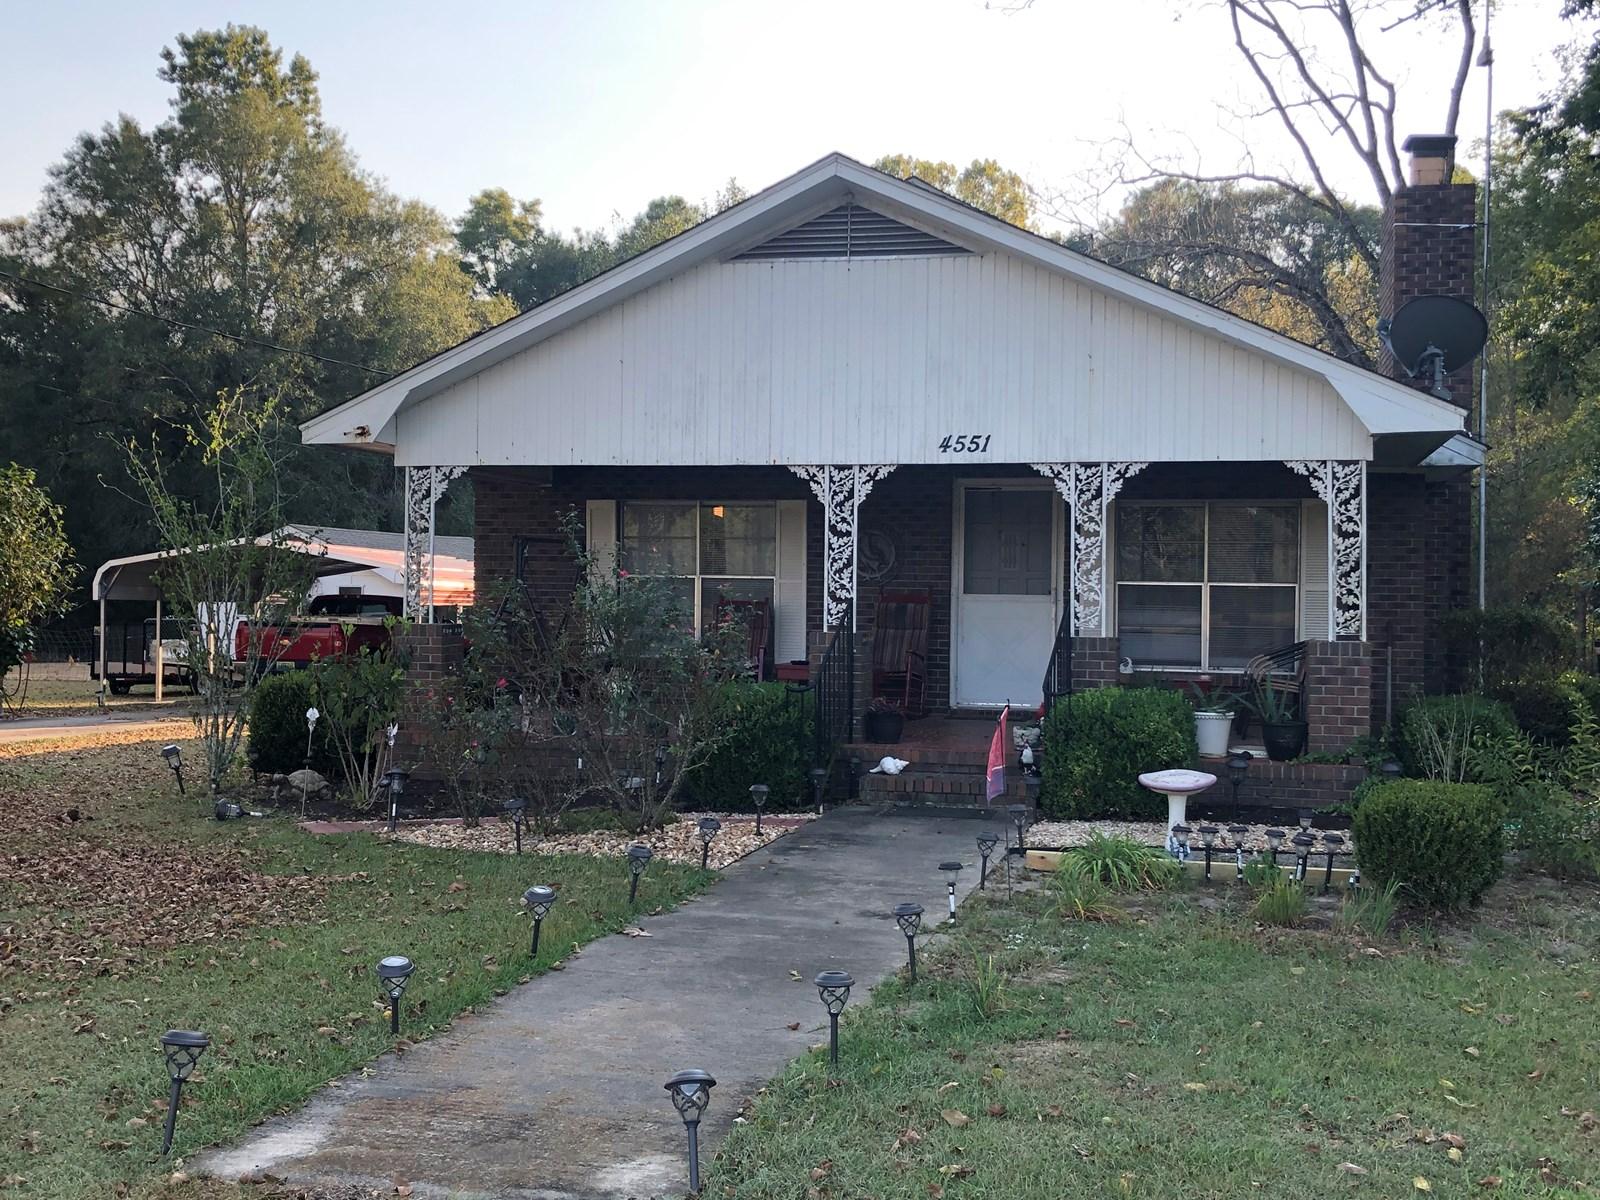 Homes for Sale Slocomb,Alabama near Florida Line